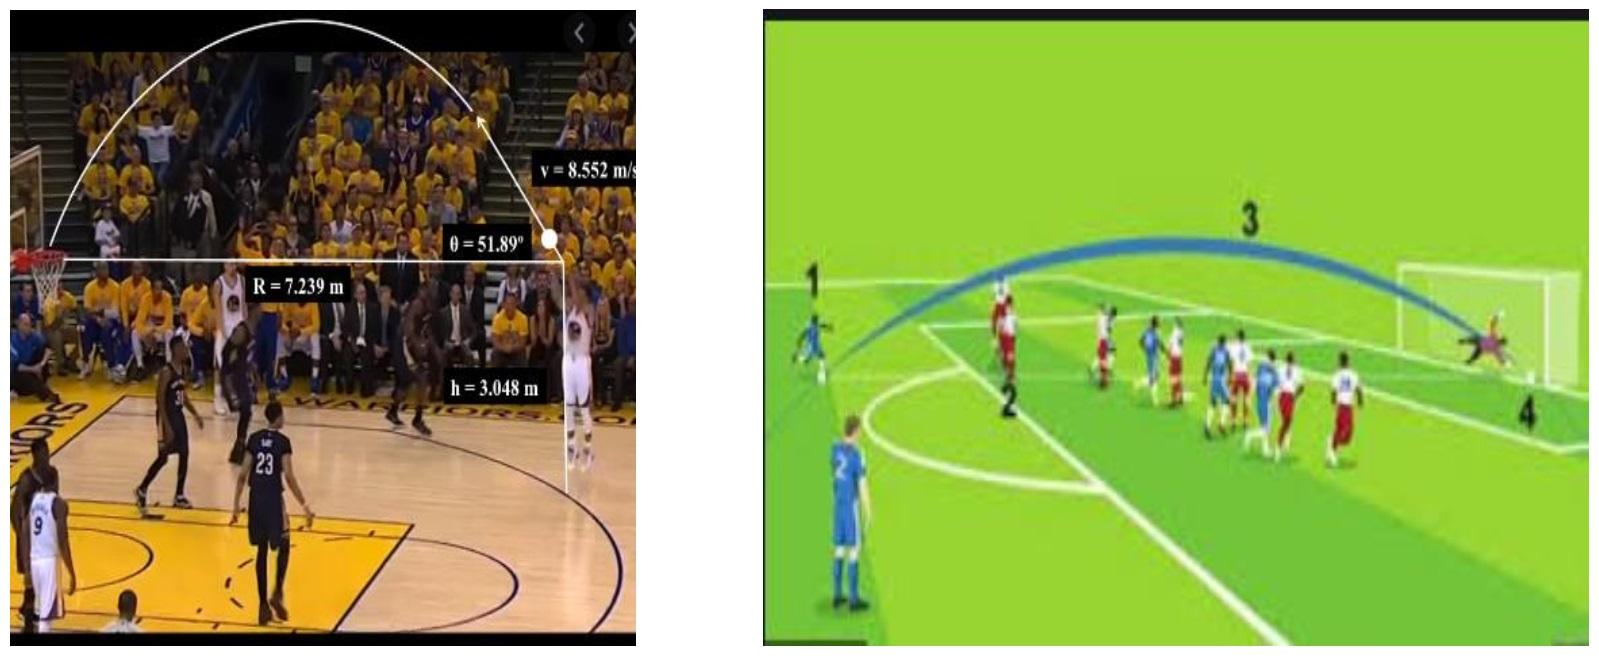 Basketball and soccer are played - Teachoo.jpg